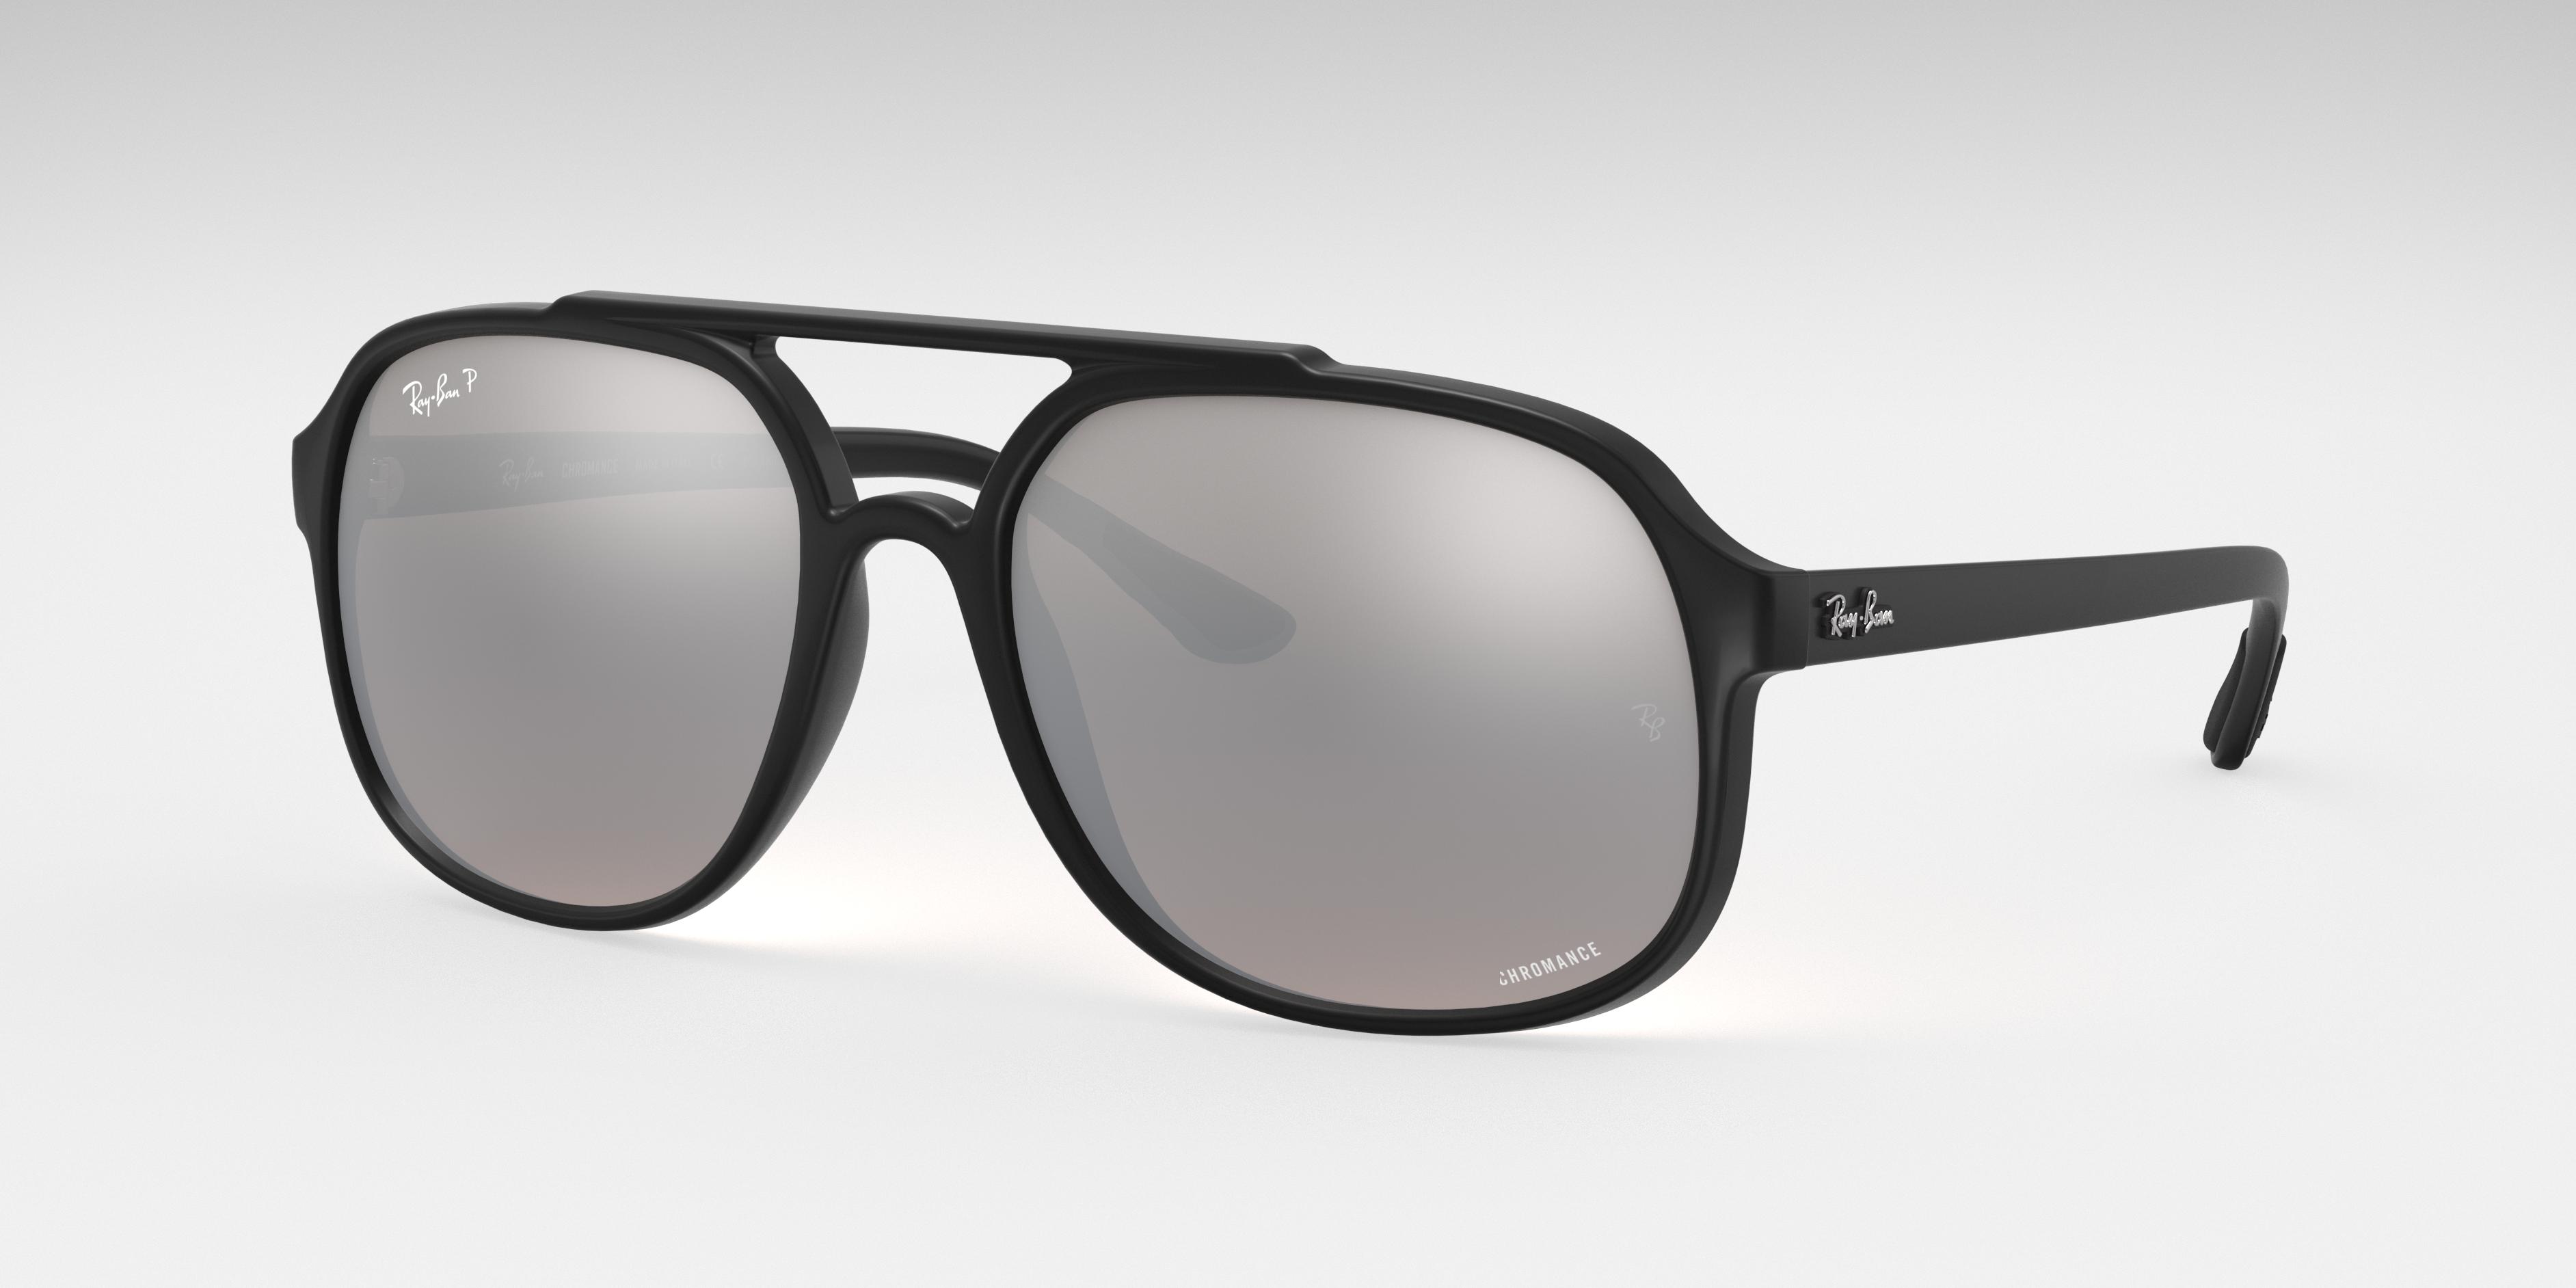 Ray-Ban Rb4312 Chromance Black, Polarized Gray Lenses - RB4312CH